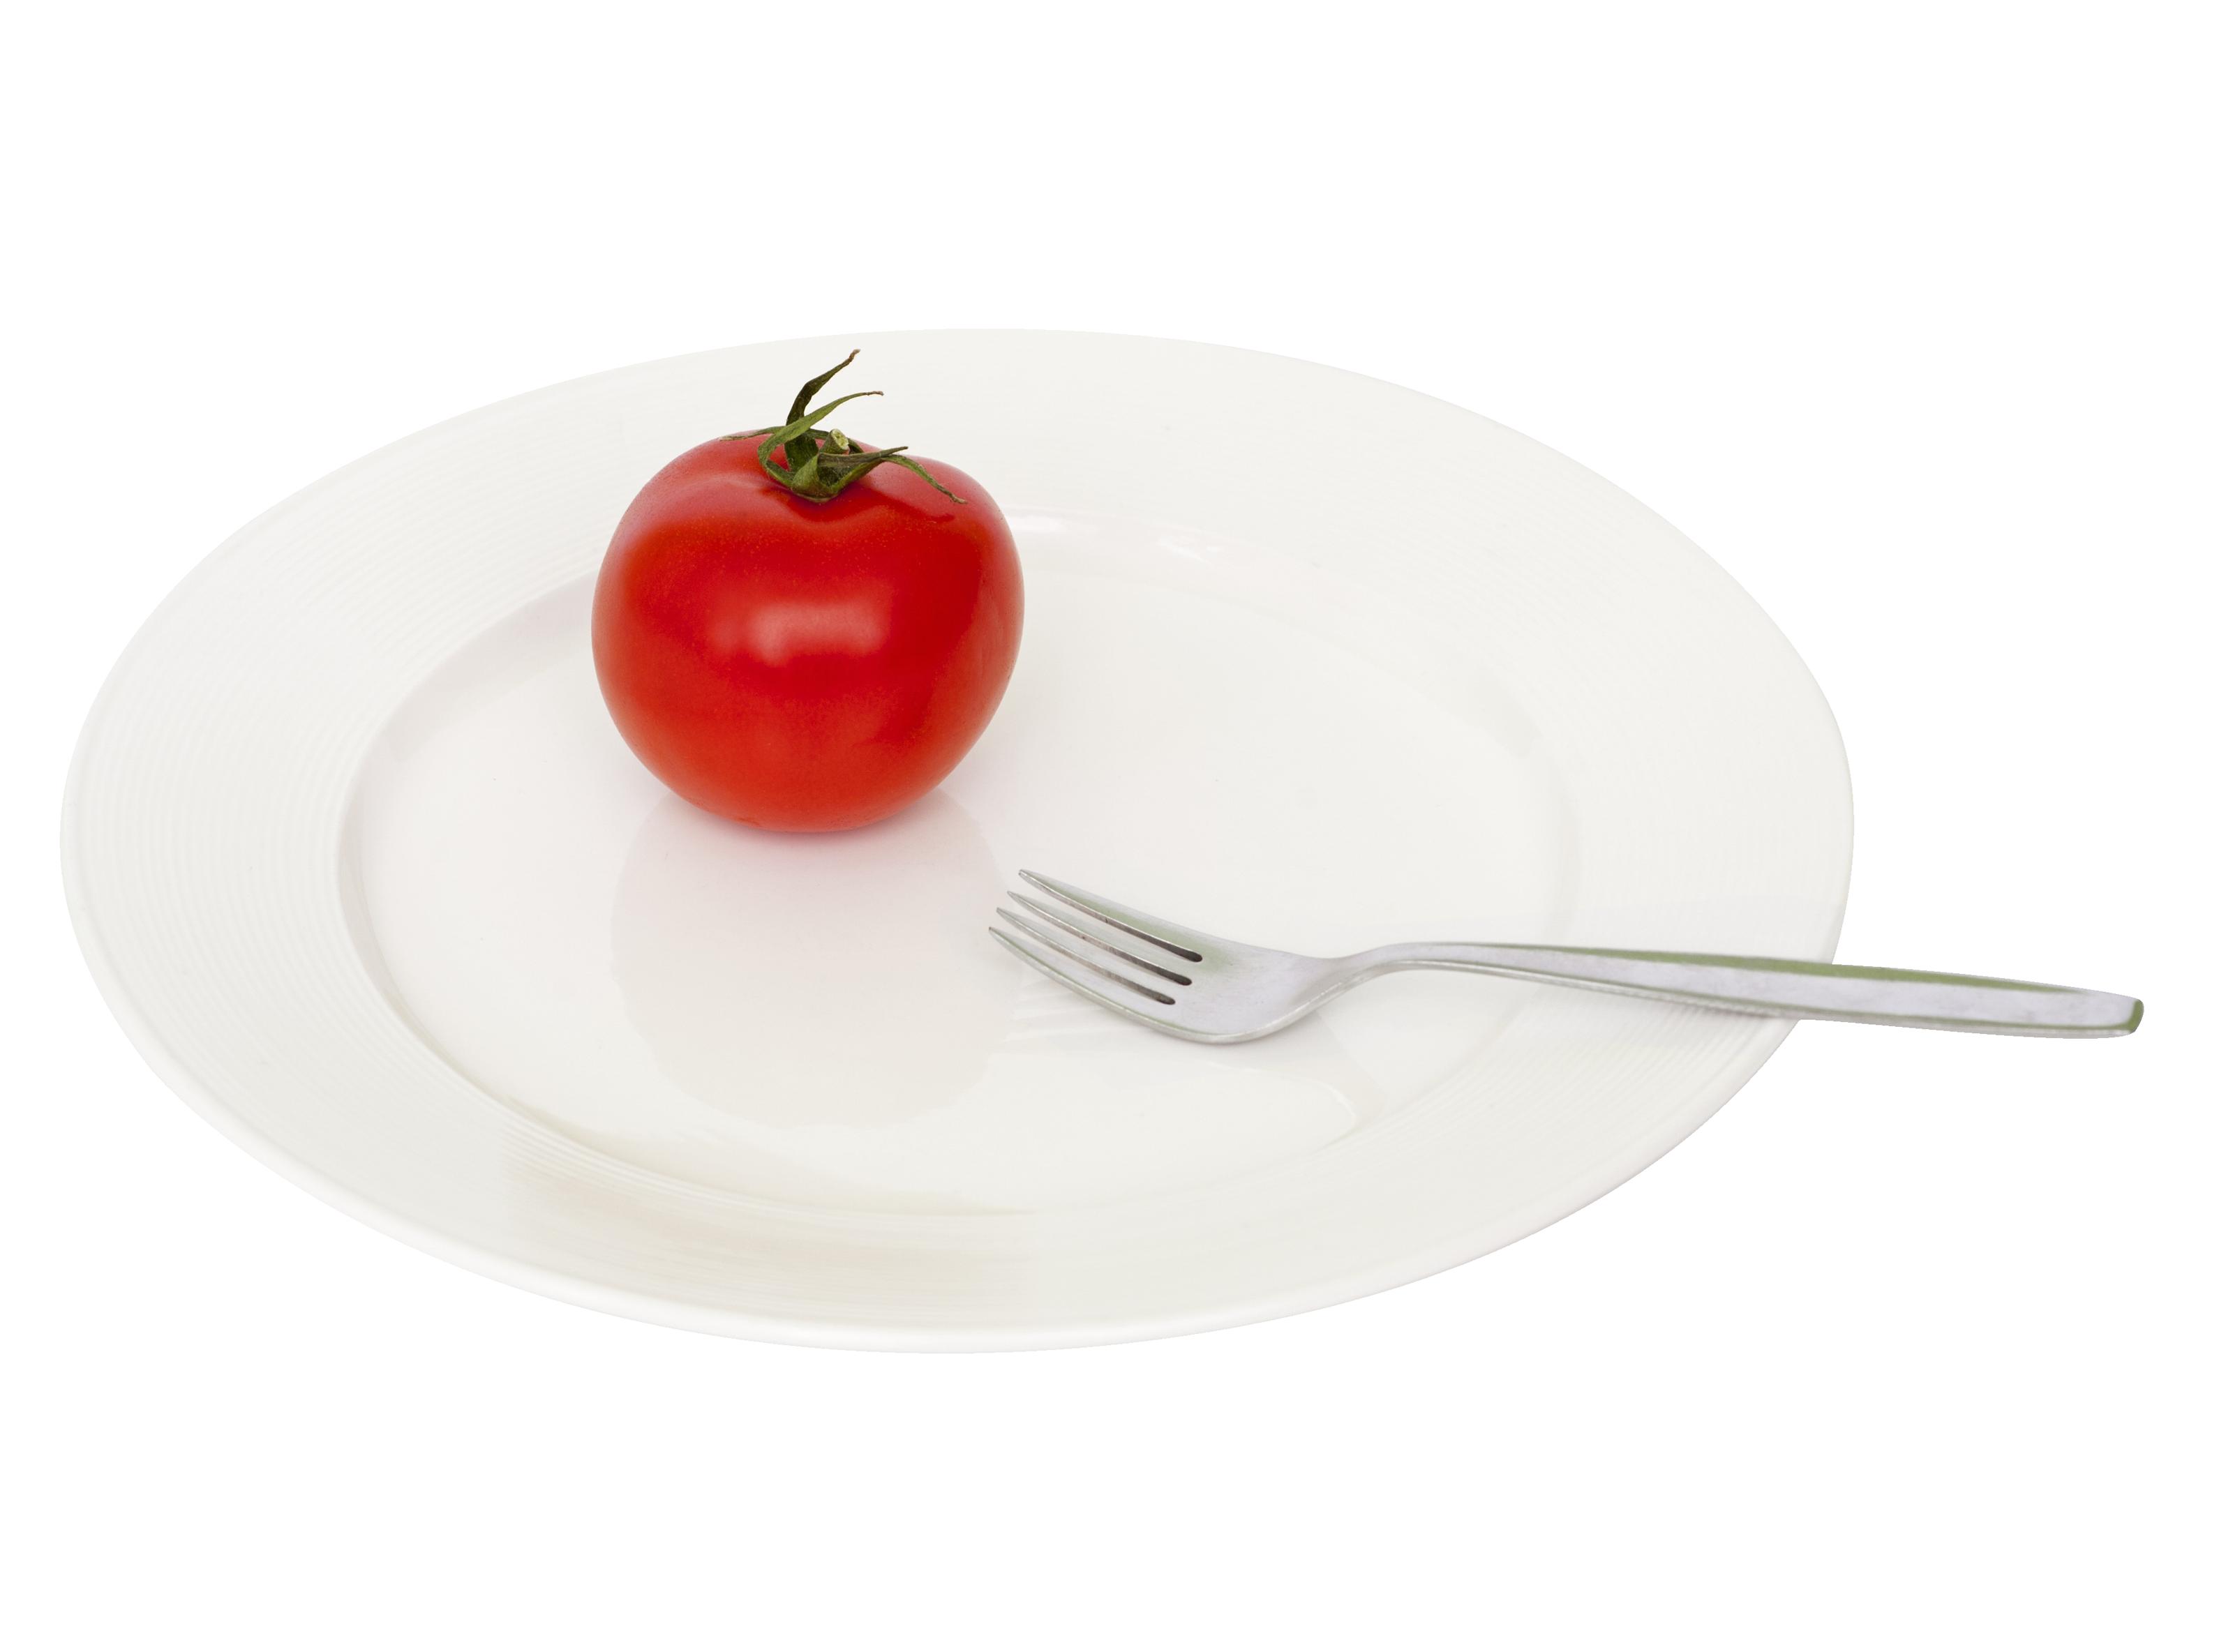 Plate Tomato Fork